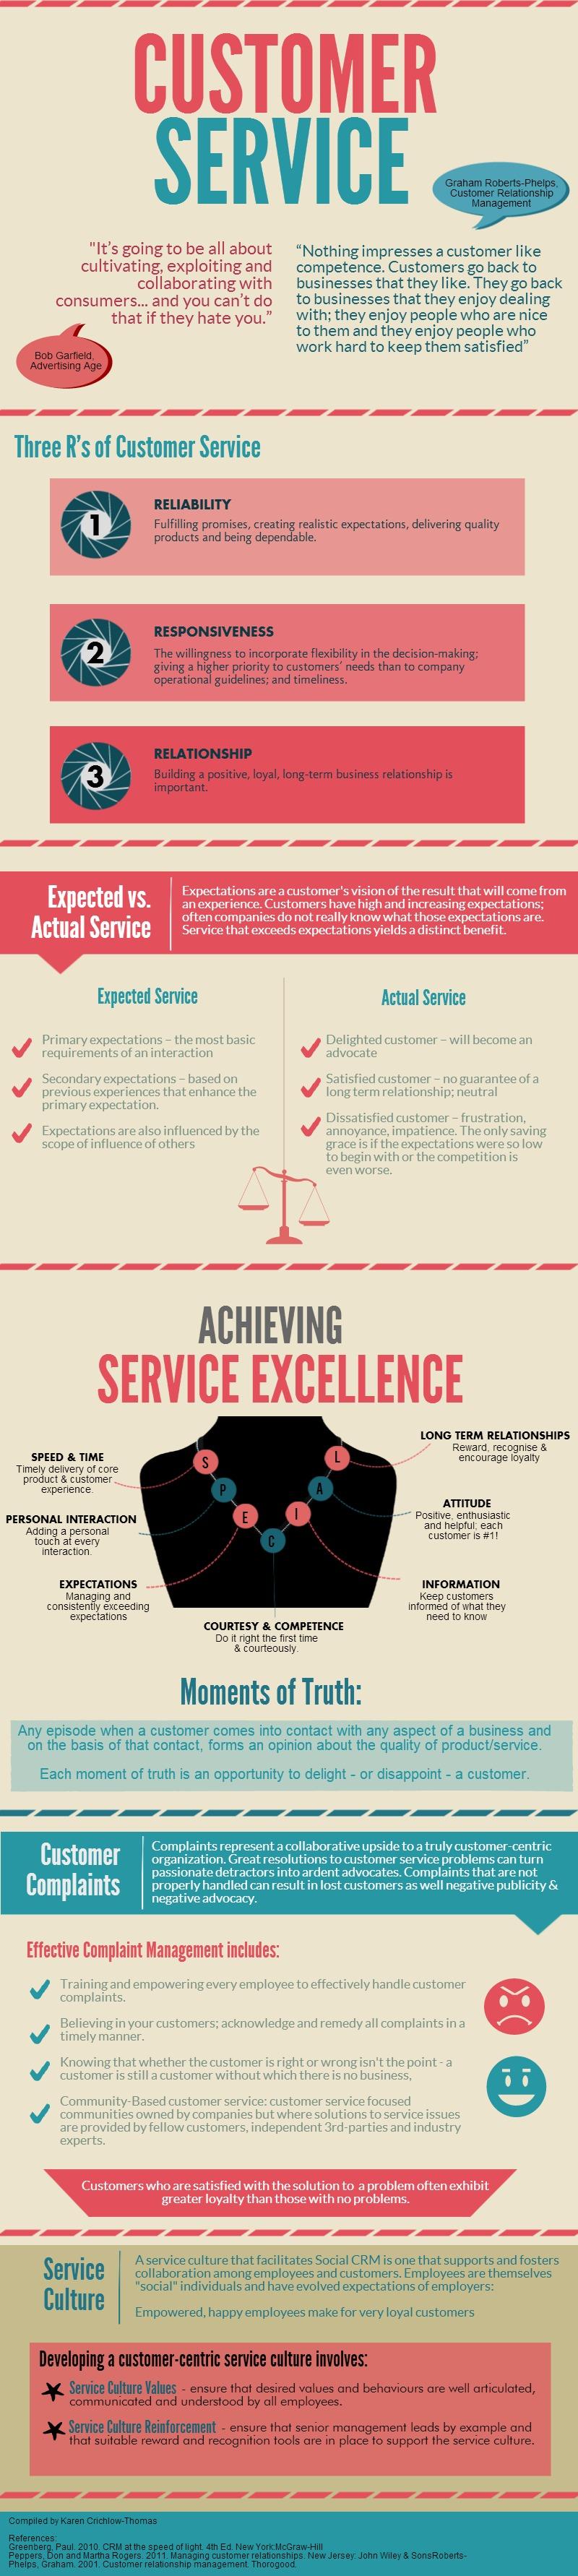 customer service job description%0A Key concepts related to Customer Service